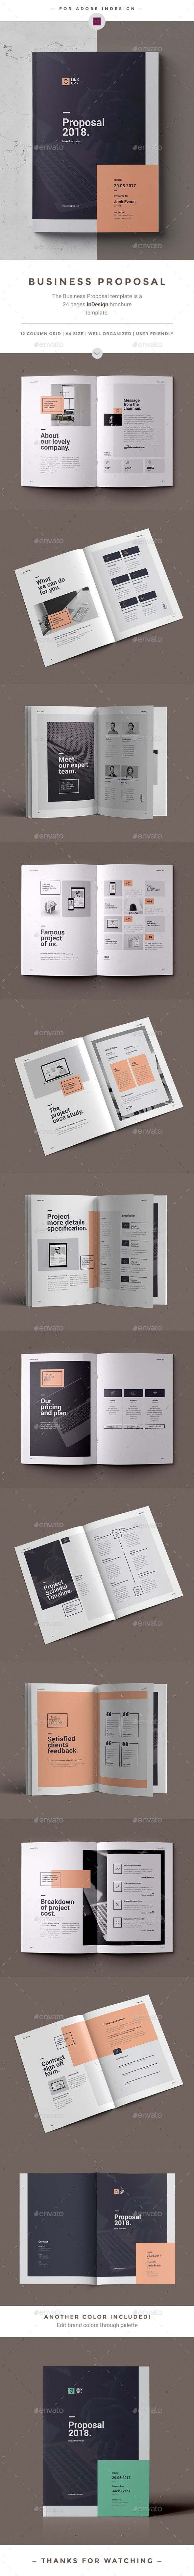 Proposal u2014 InDesign INDD project proposal best